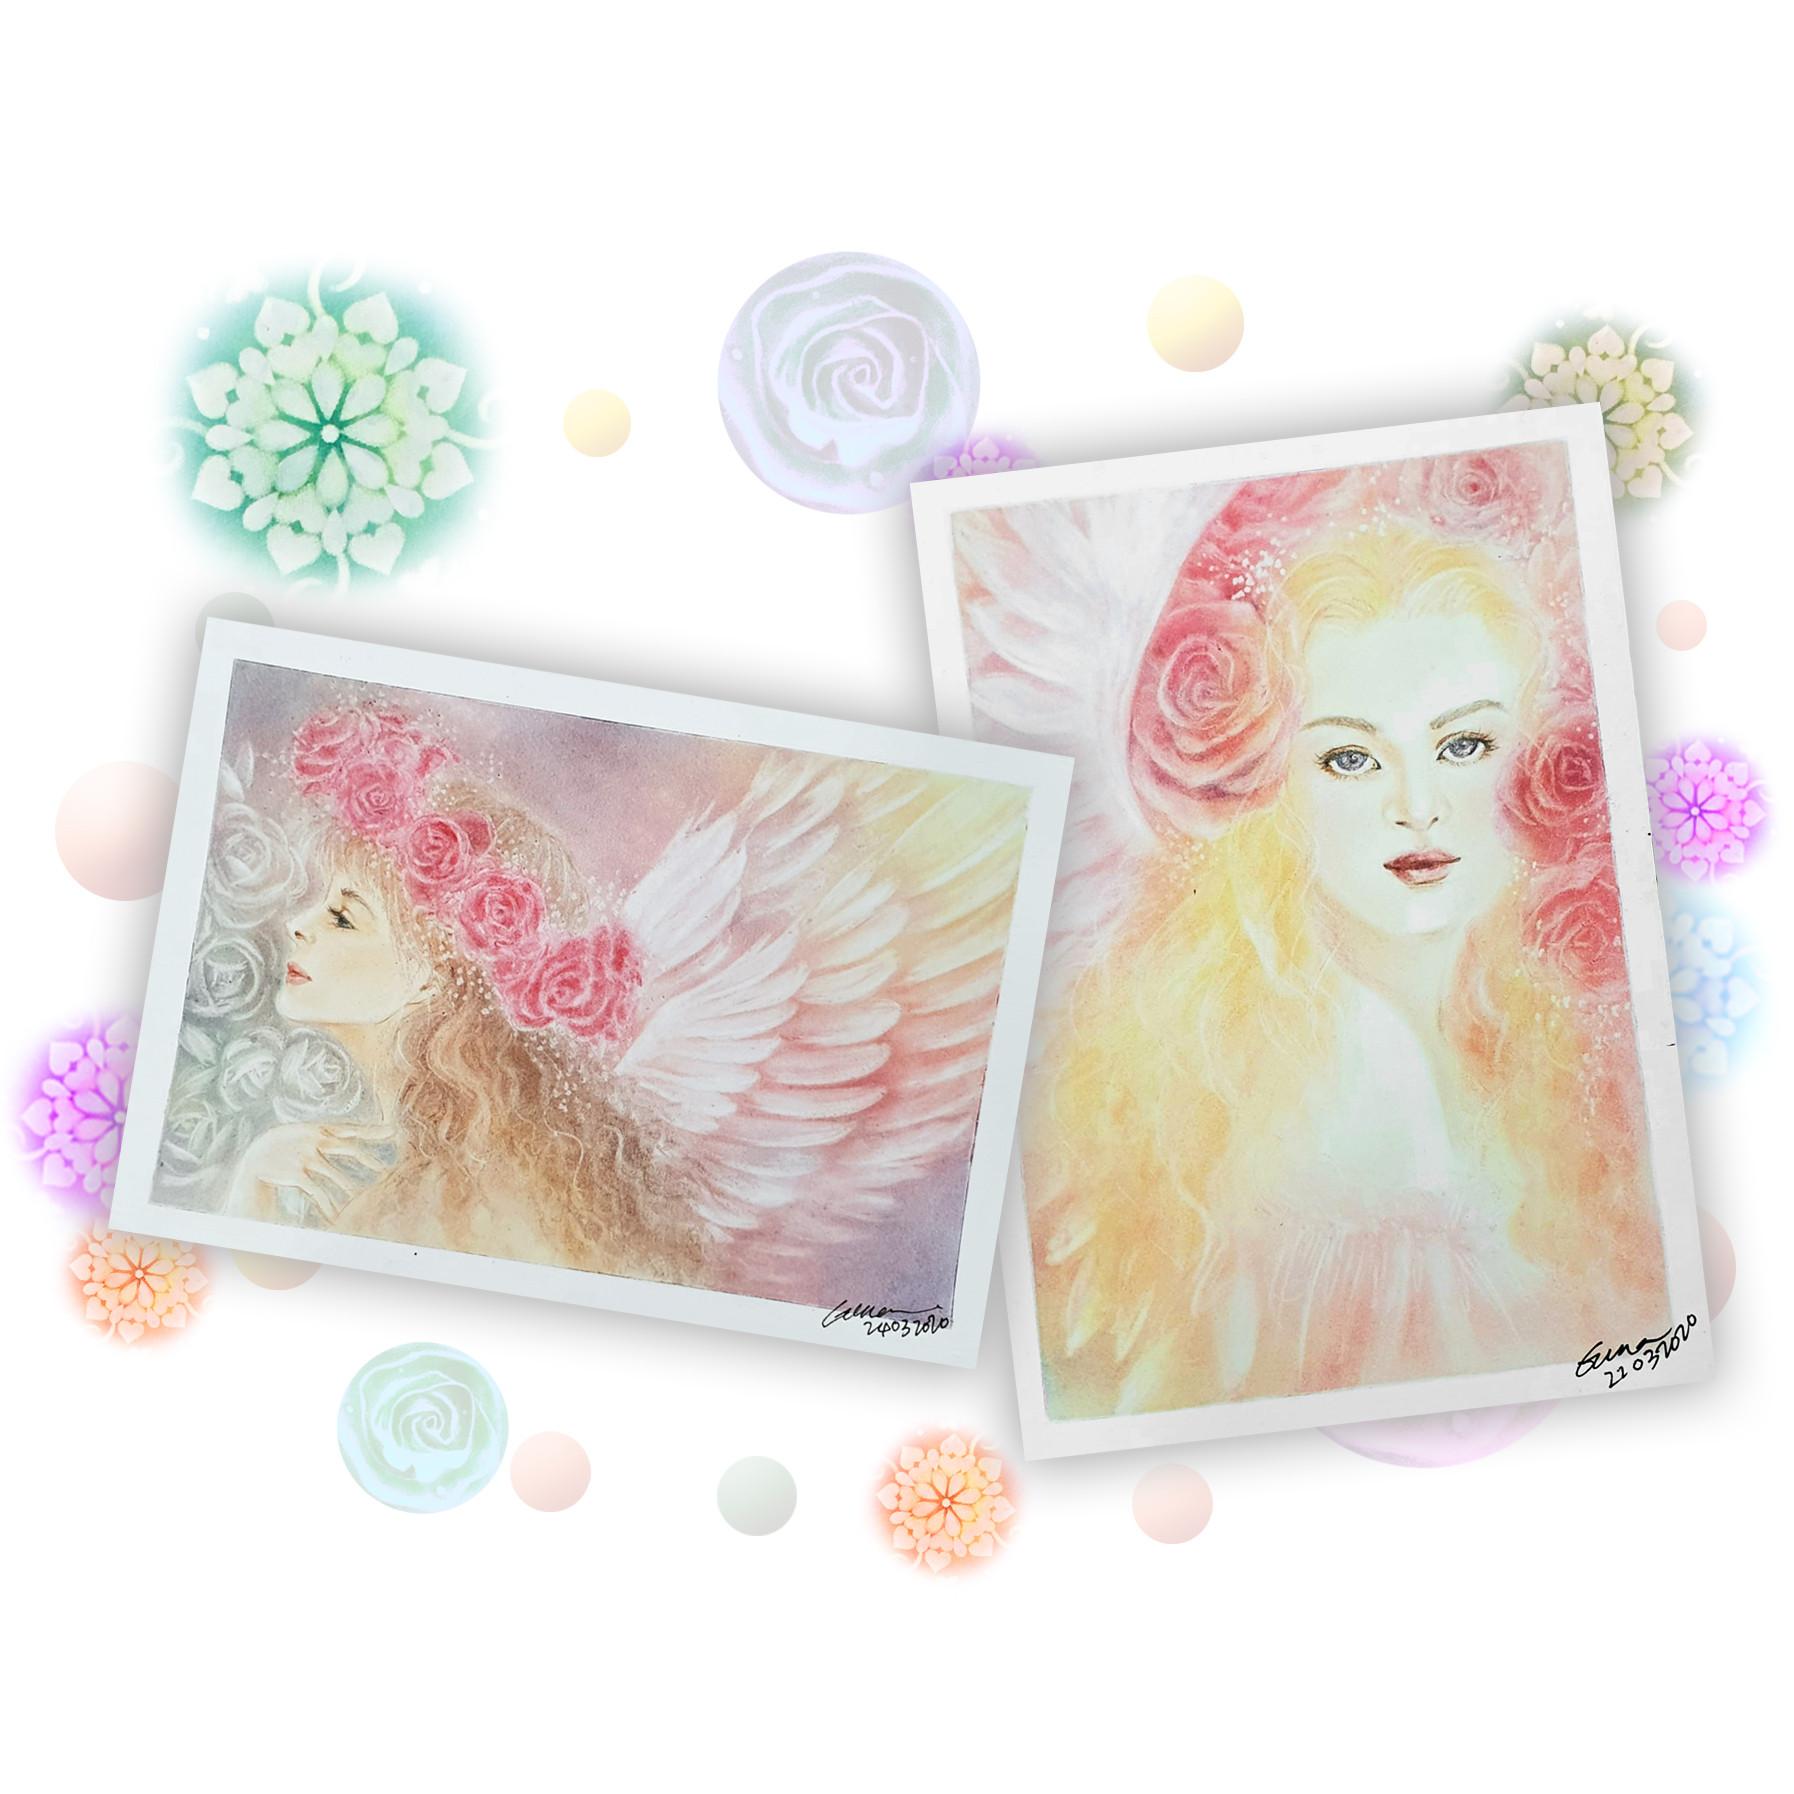 Part 3- Angel Blessing Pastel Art Course